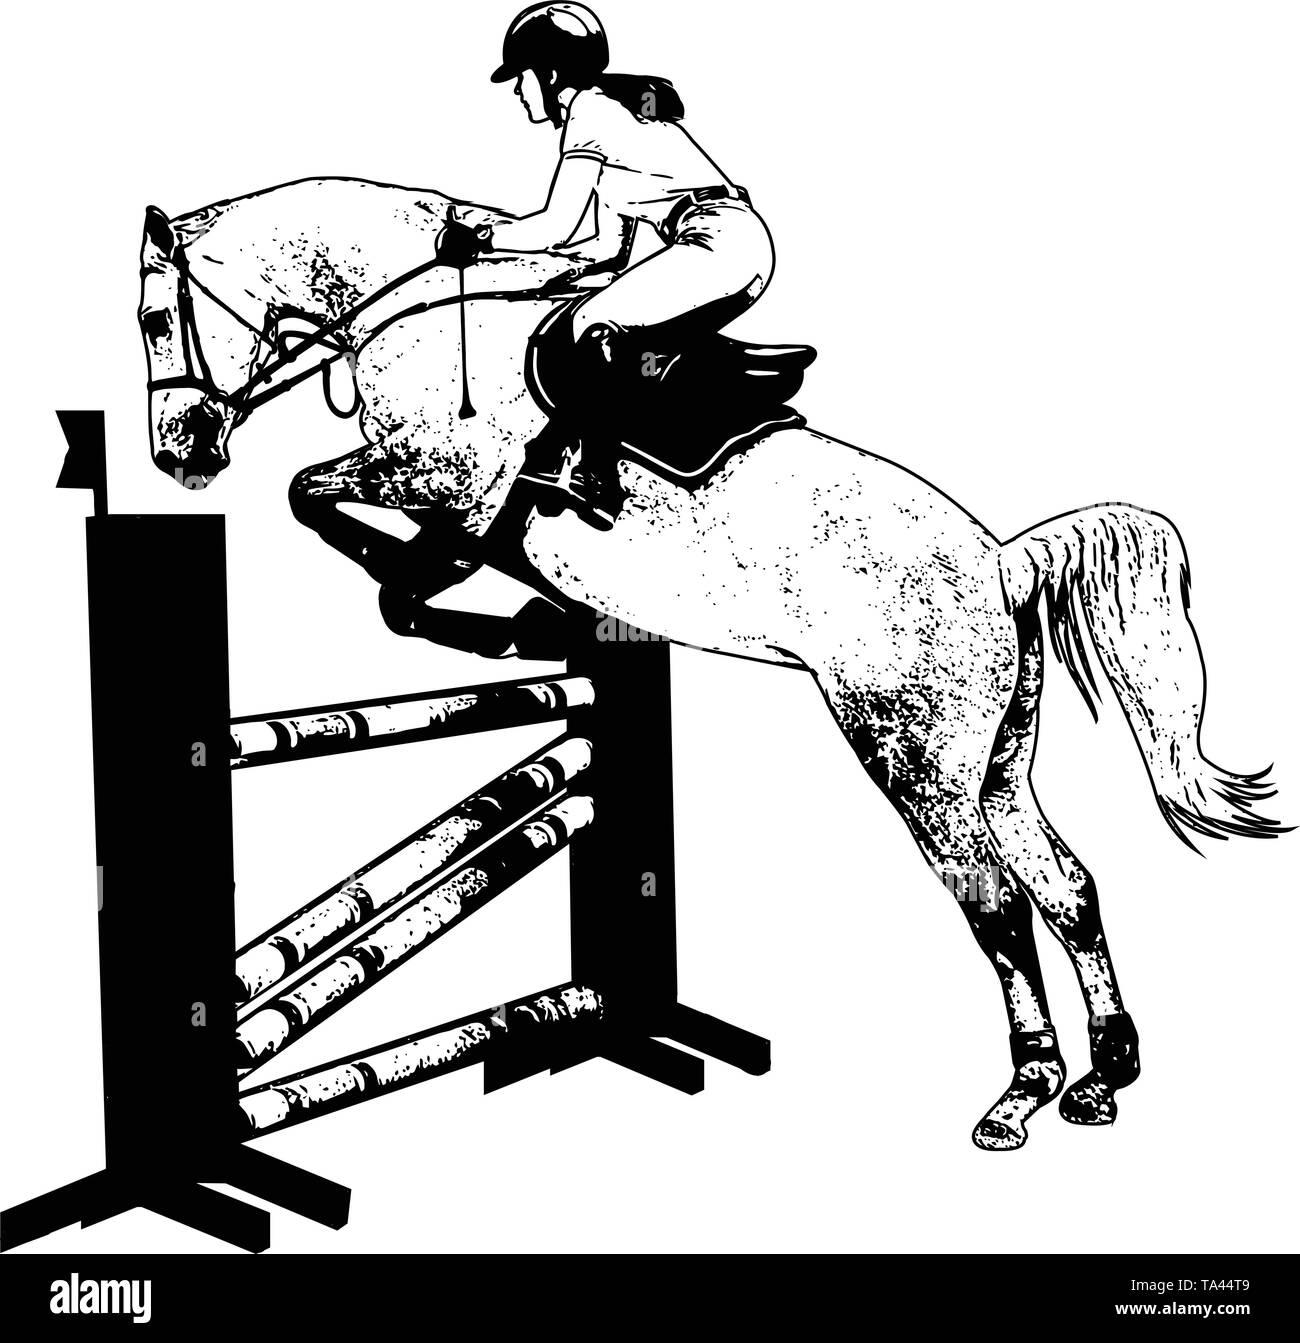 jumping show. horse with jockey jumping a hurdle sketch illustration - vector - Stock Image